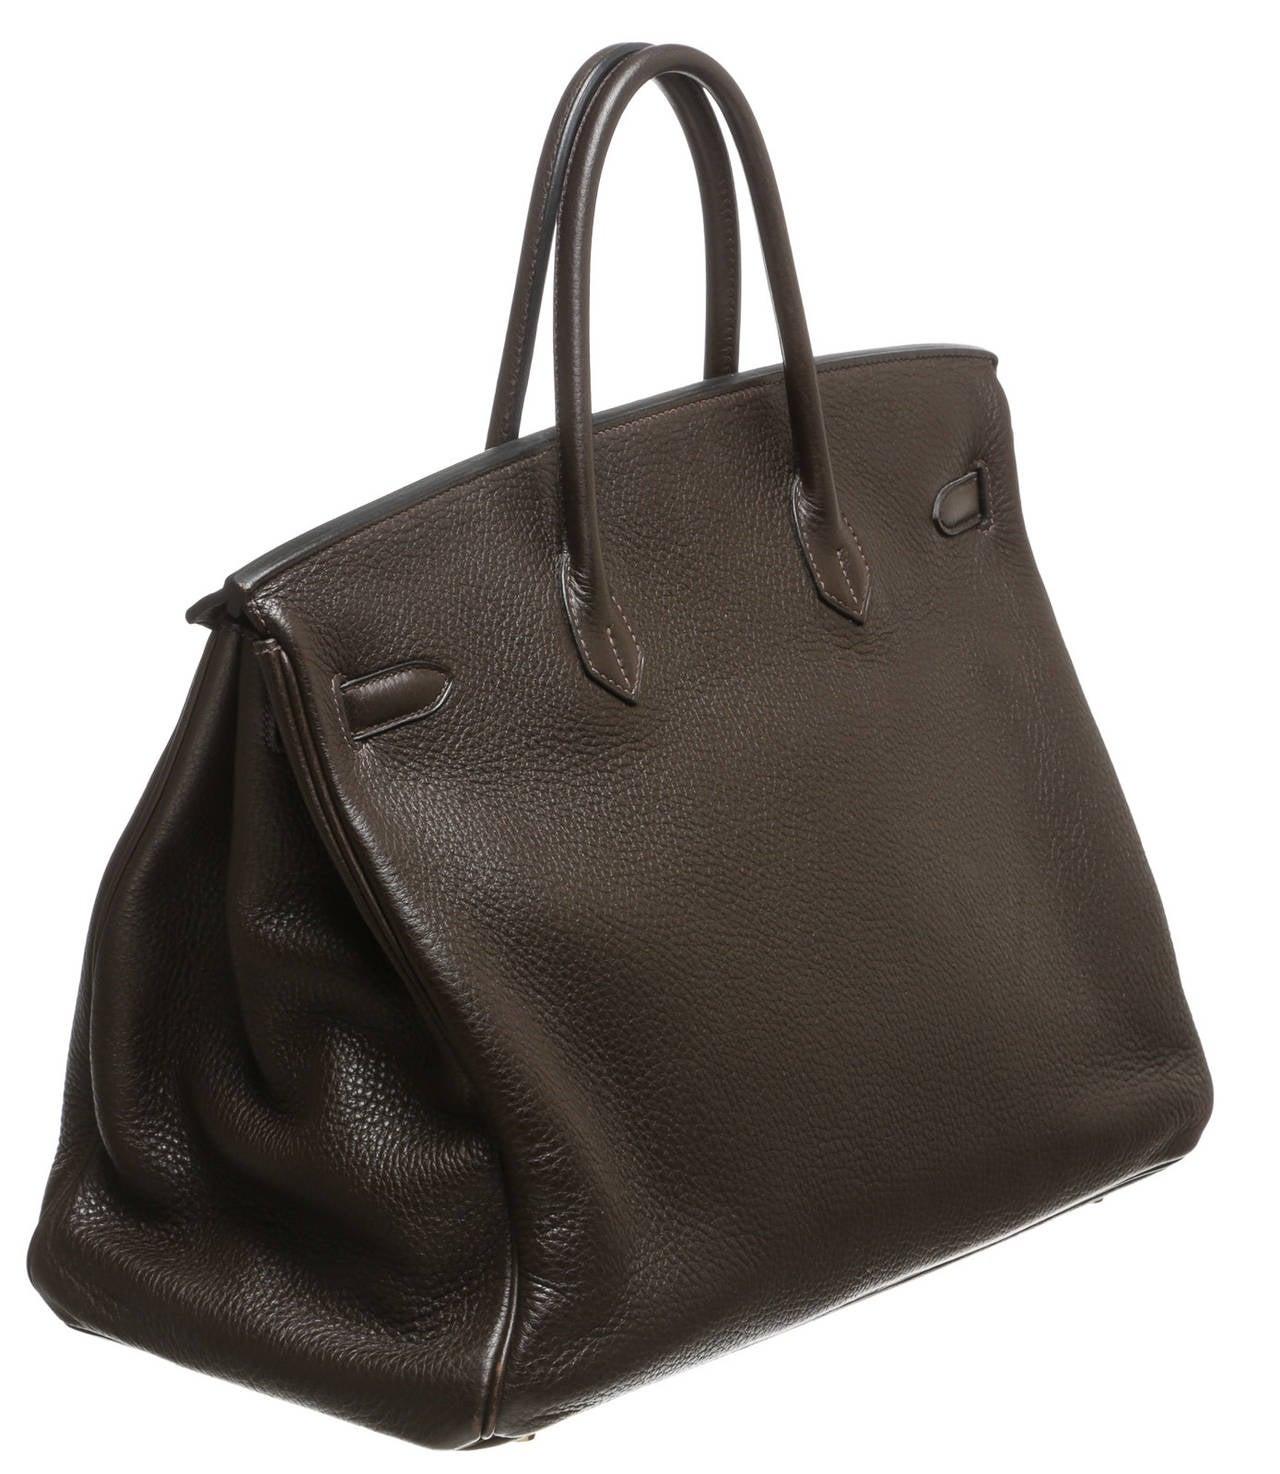 Hermes Brown Clemence Leather 40cm Birkin Handbag GHW at 1stdibs